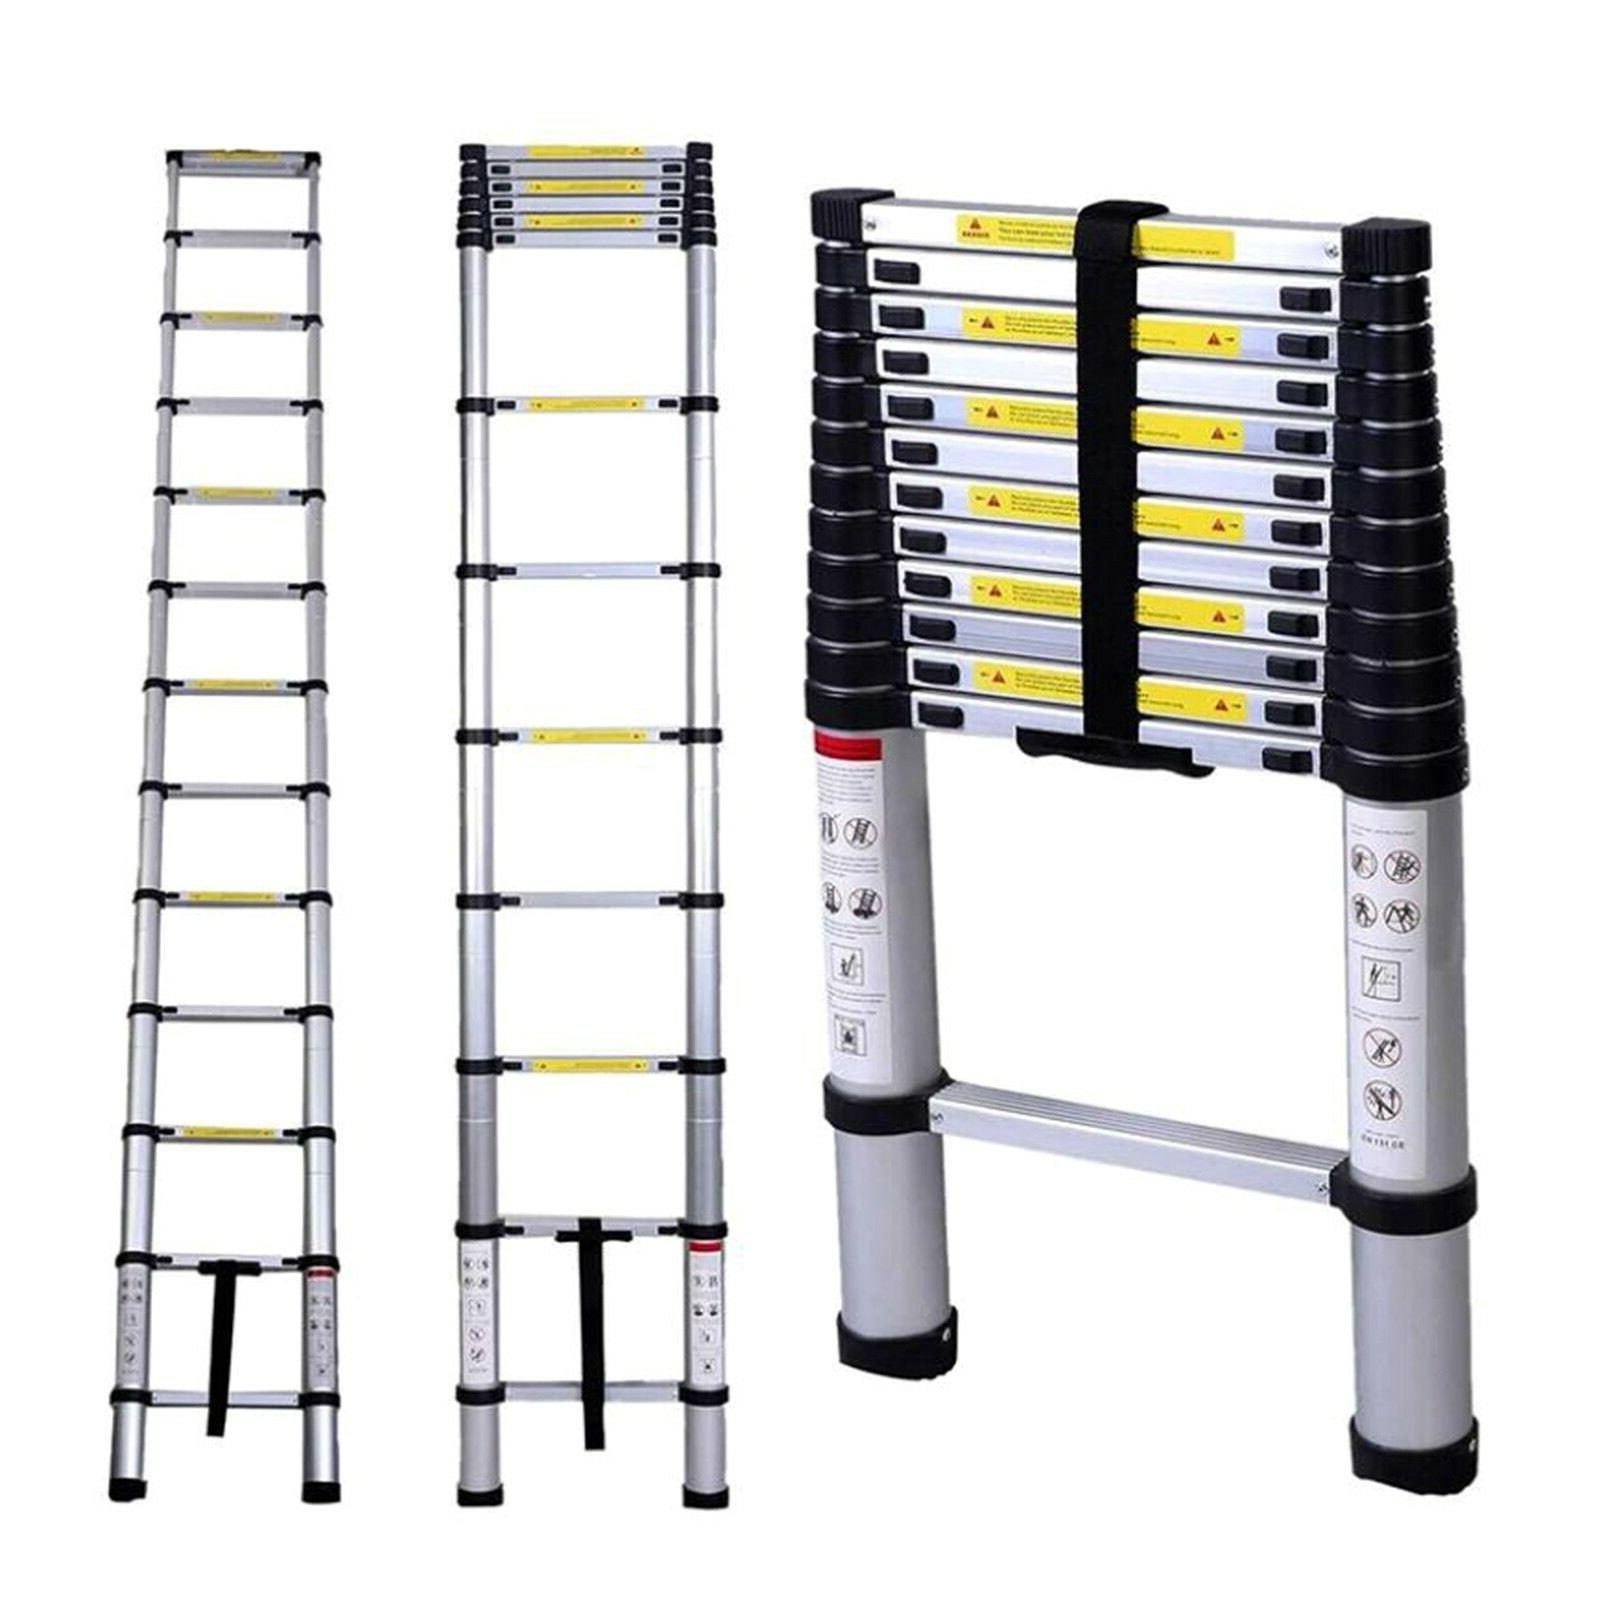 10.5FT Multi-Purpose Ladder Tall EN131